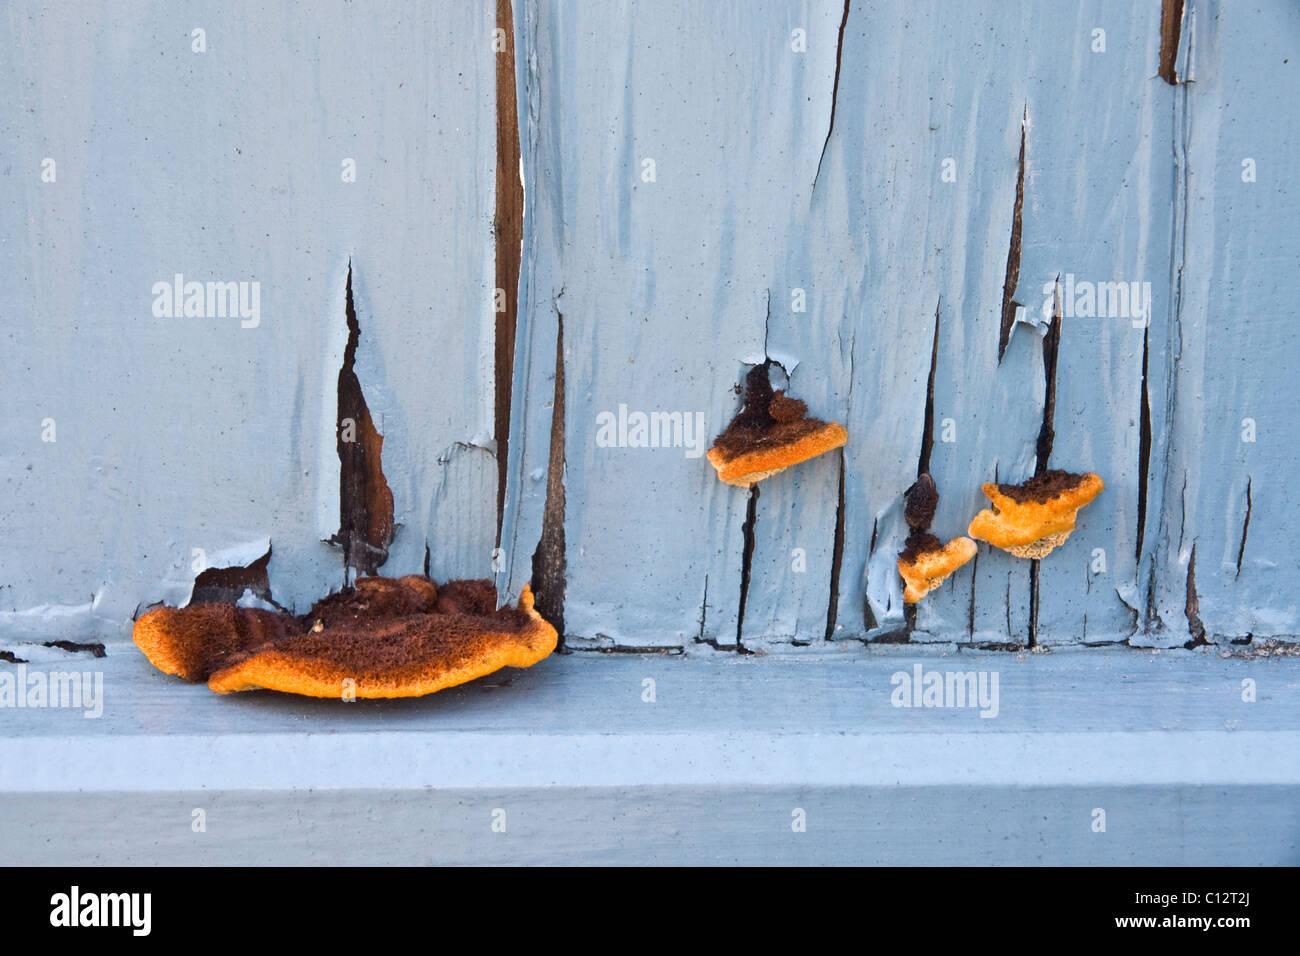 Fungi (GloeoOphyllum sepiarium) Conifer mazegill, growing amid the peeling paint on a neglected garden gate in England. - Stock Image